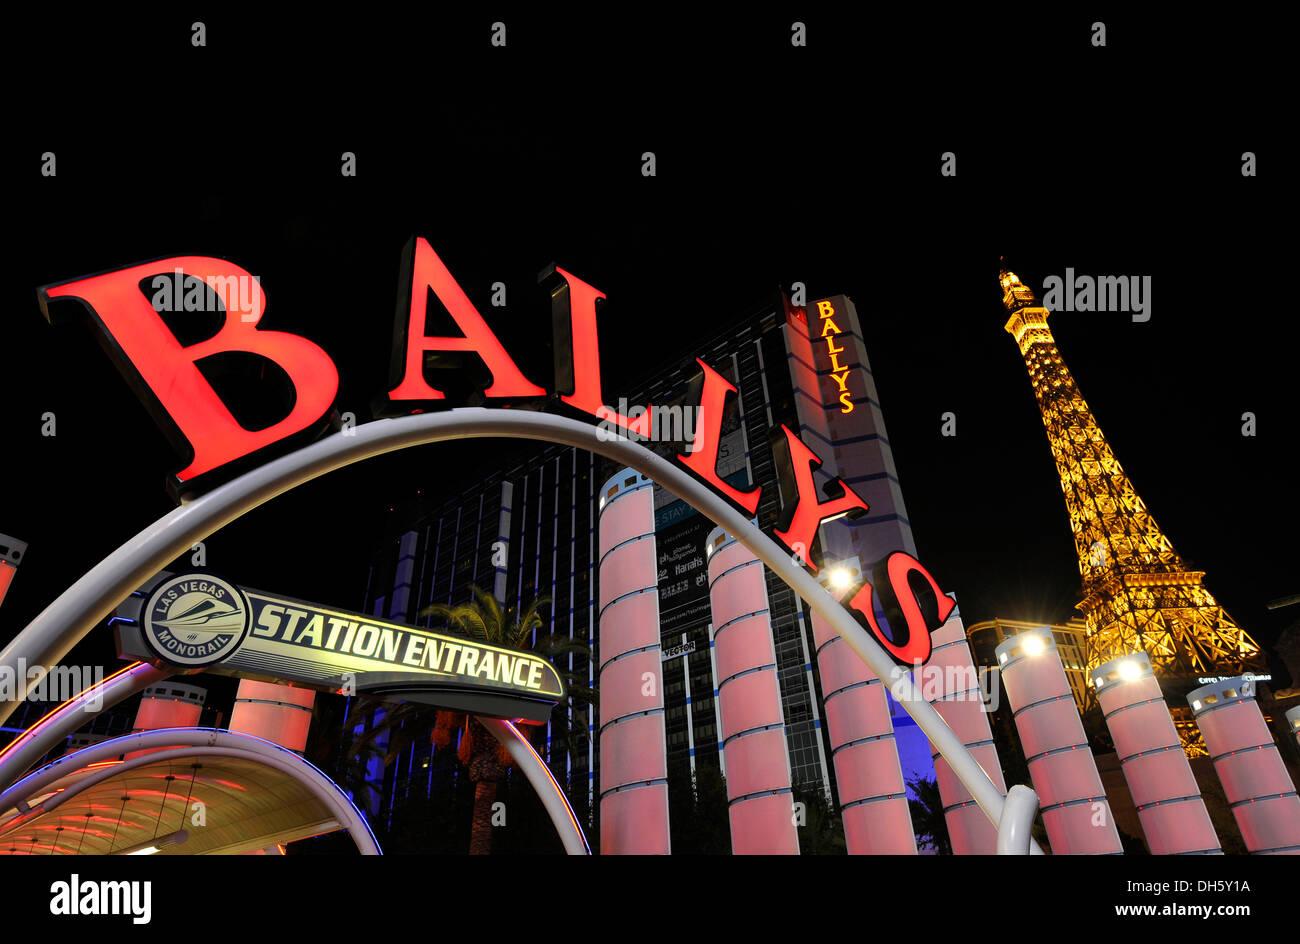 Vegas Shoe Stores On The Strip